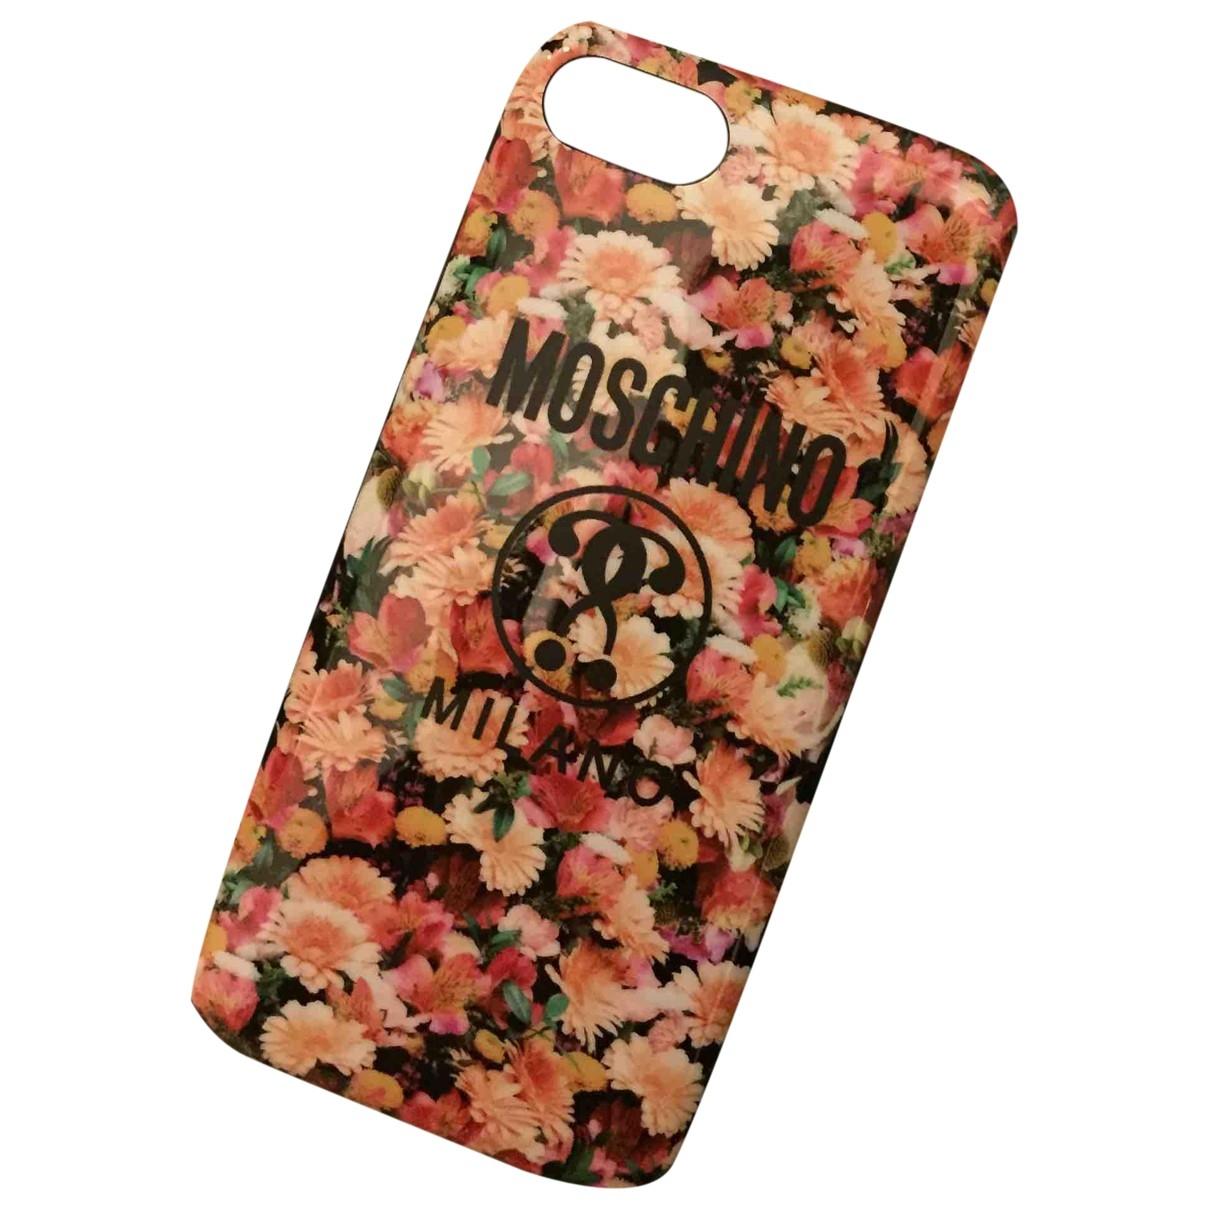 Moschino - Accessoires   pour lifestyle